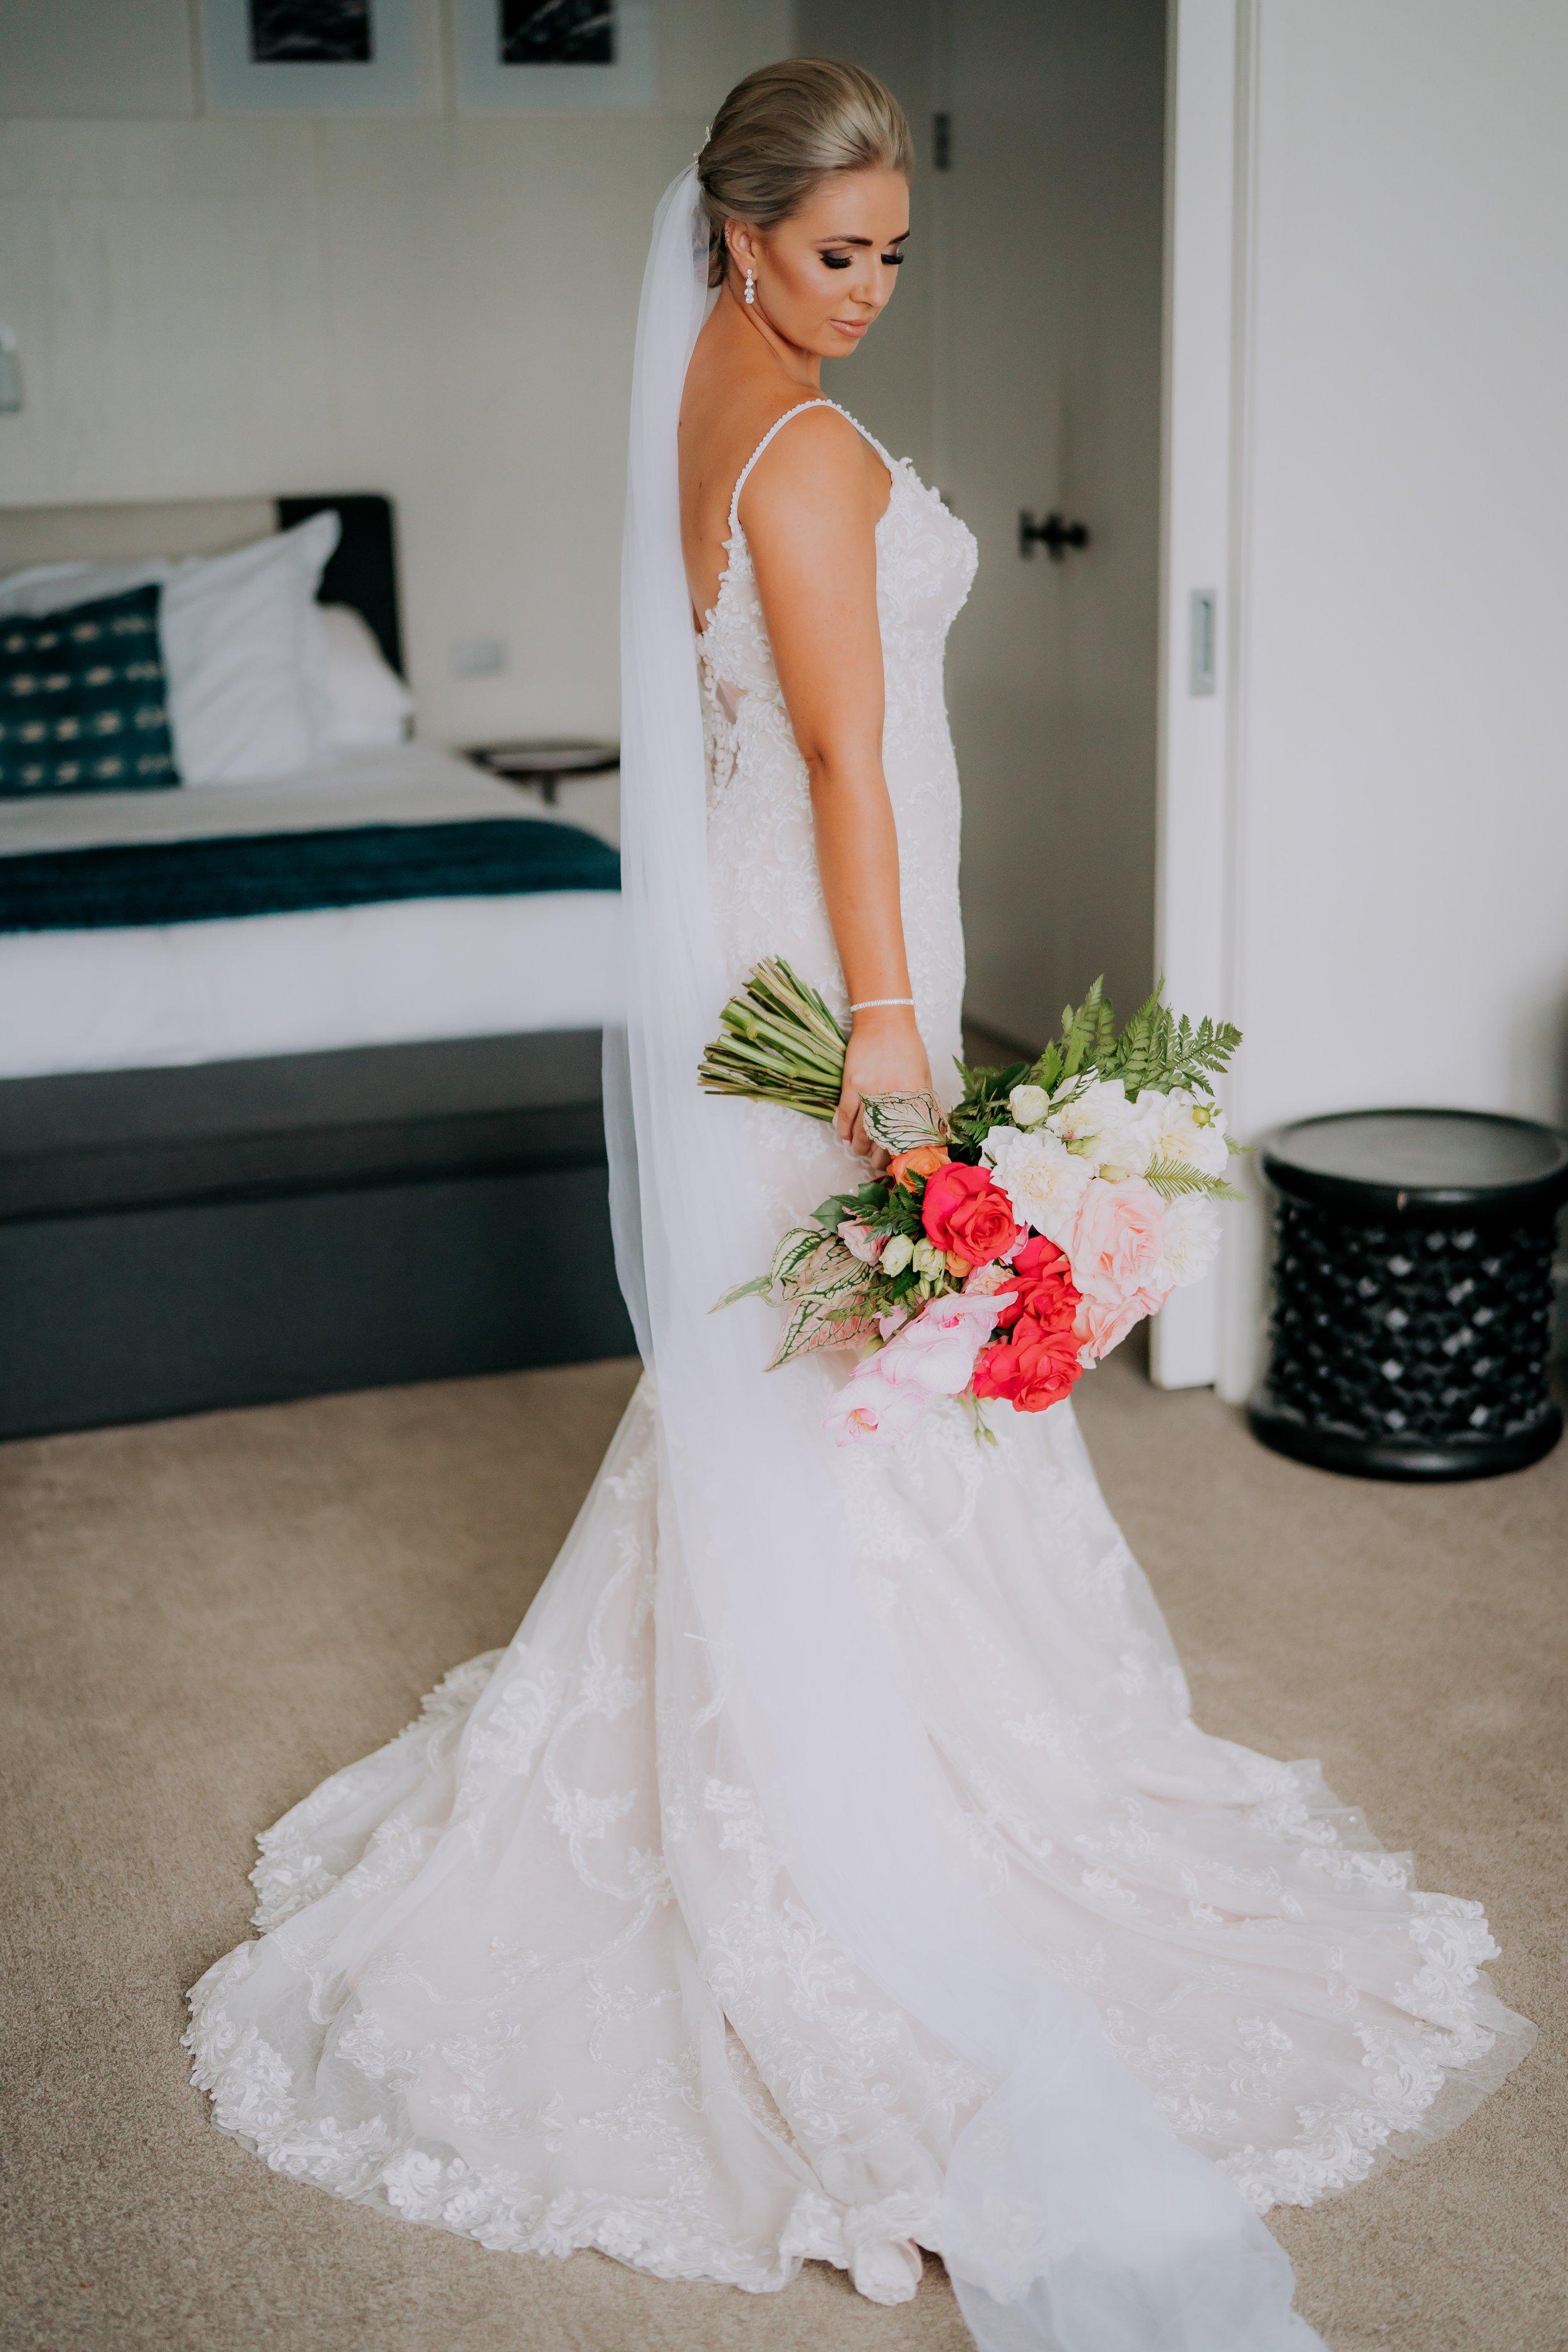 ava-me-photography-gemma-brent-zest-point-piper-sydney-wedding-224.jpg